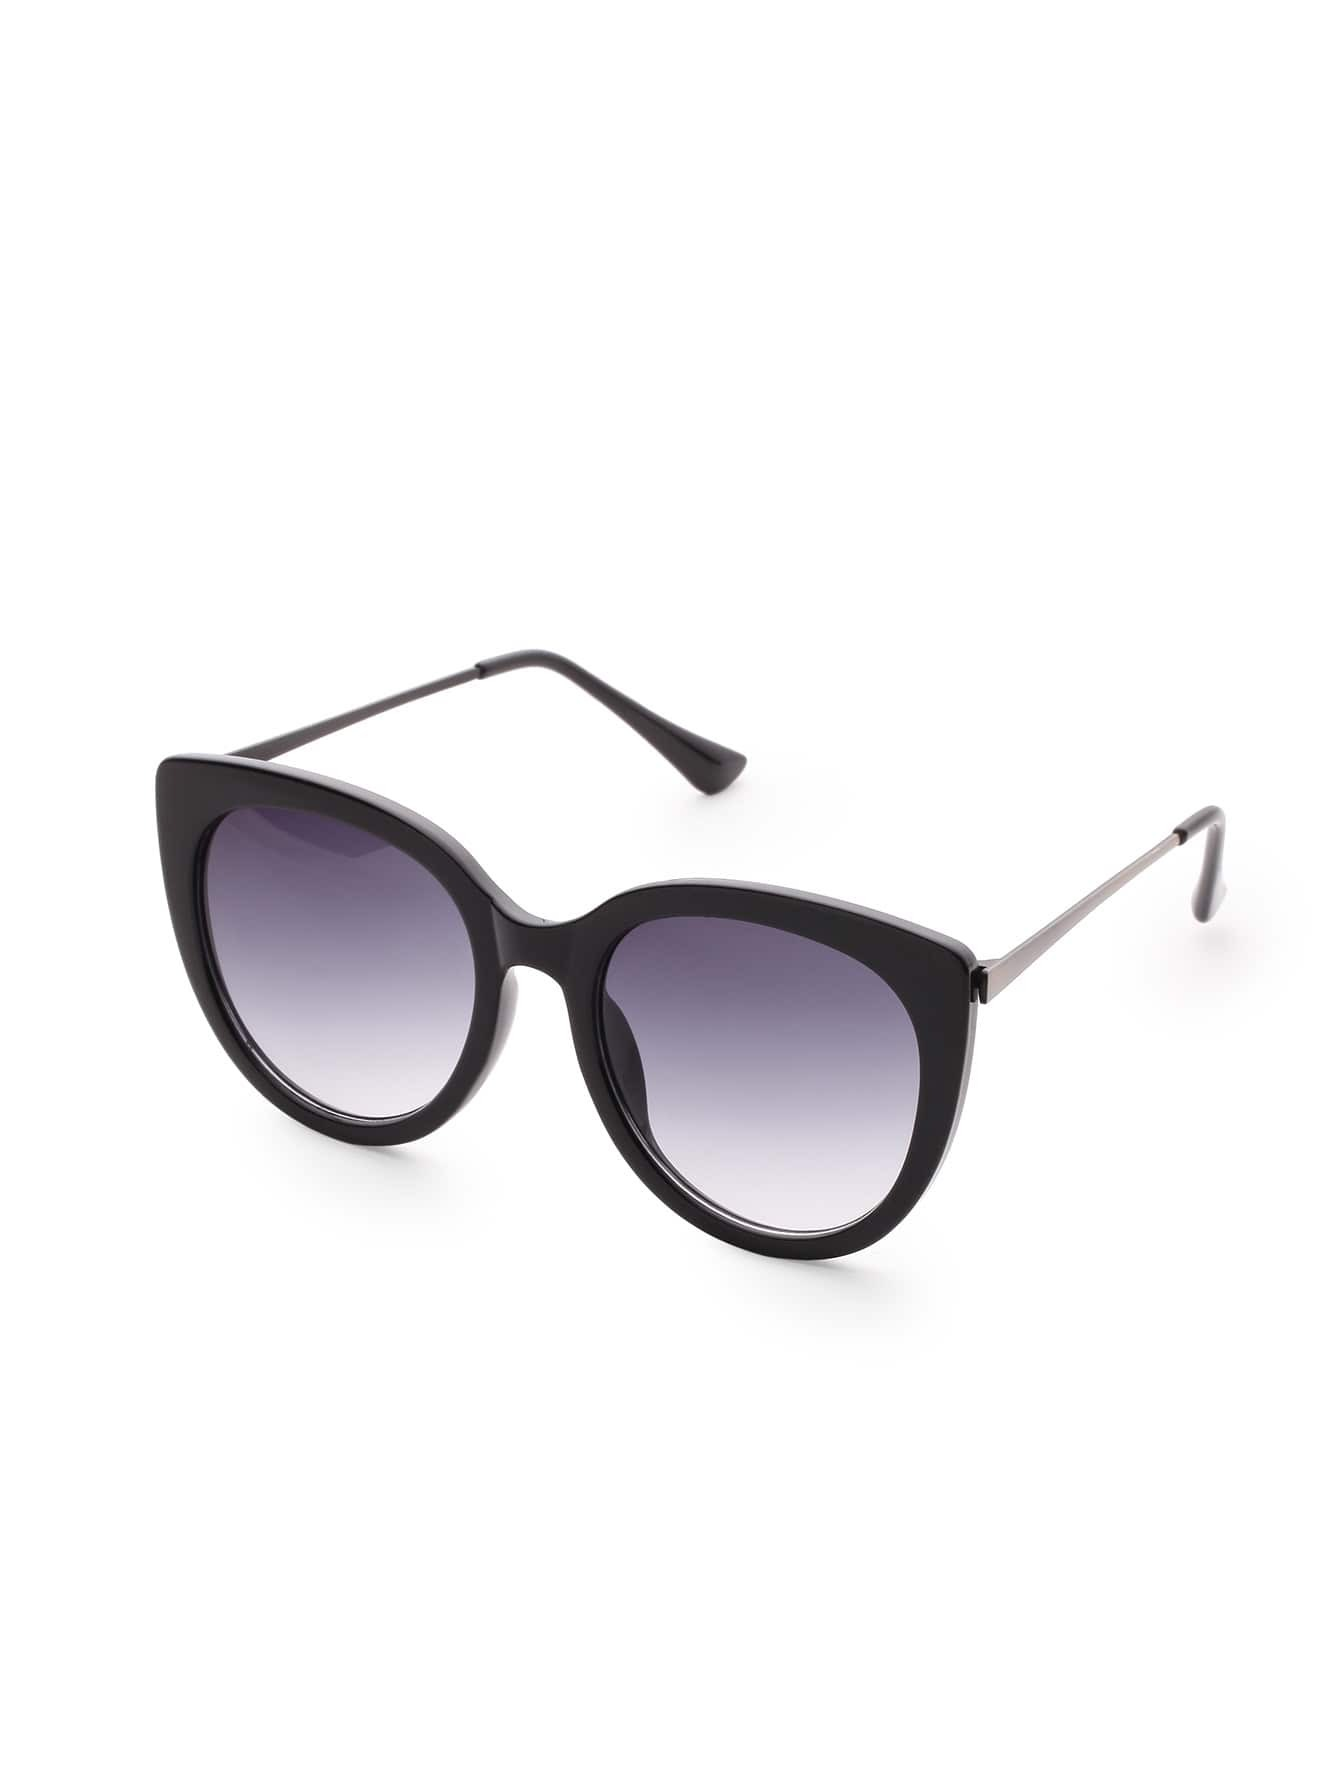 Black Frame Cat Eye Sunglasses -SheIn(Sheinside)